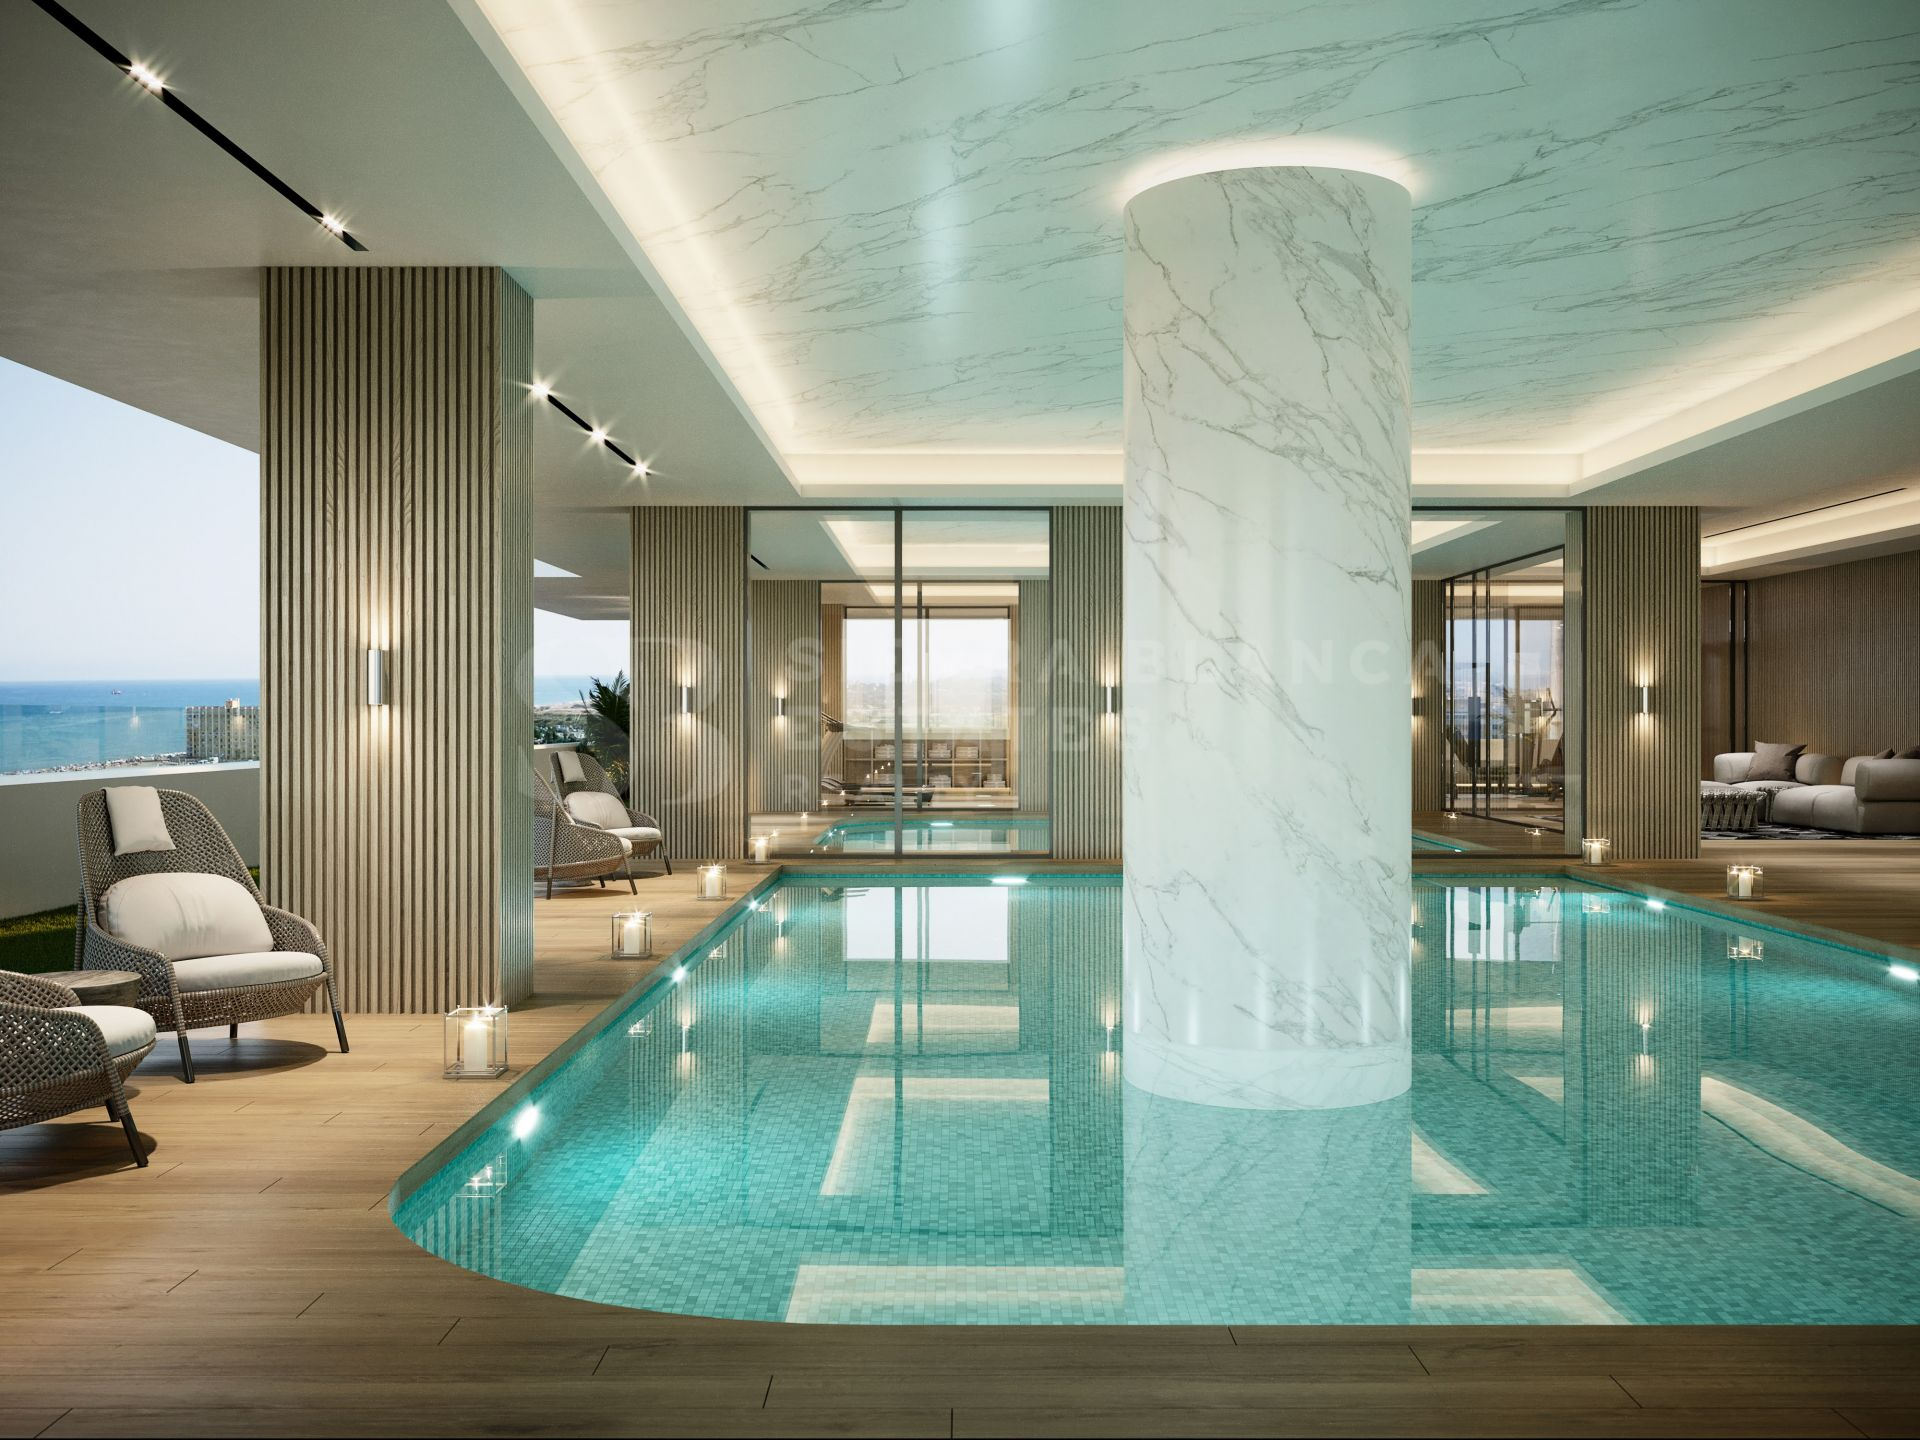 Sierra Blanca Tower - Luxury Beachfront Apartments in Malaga